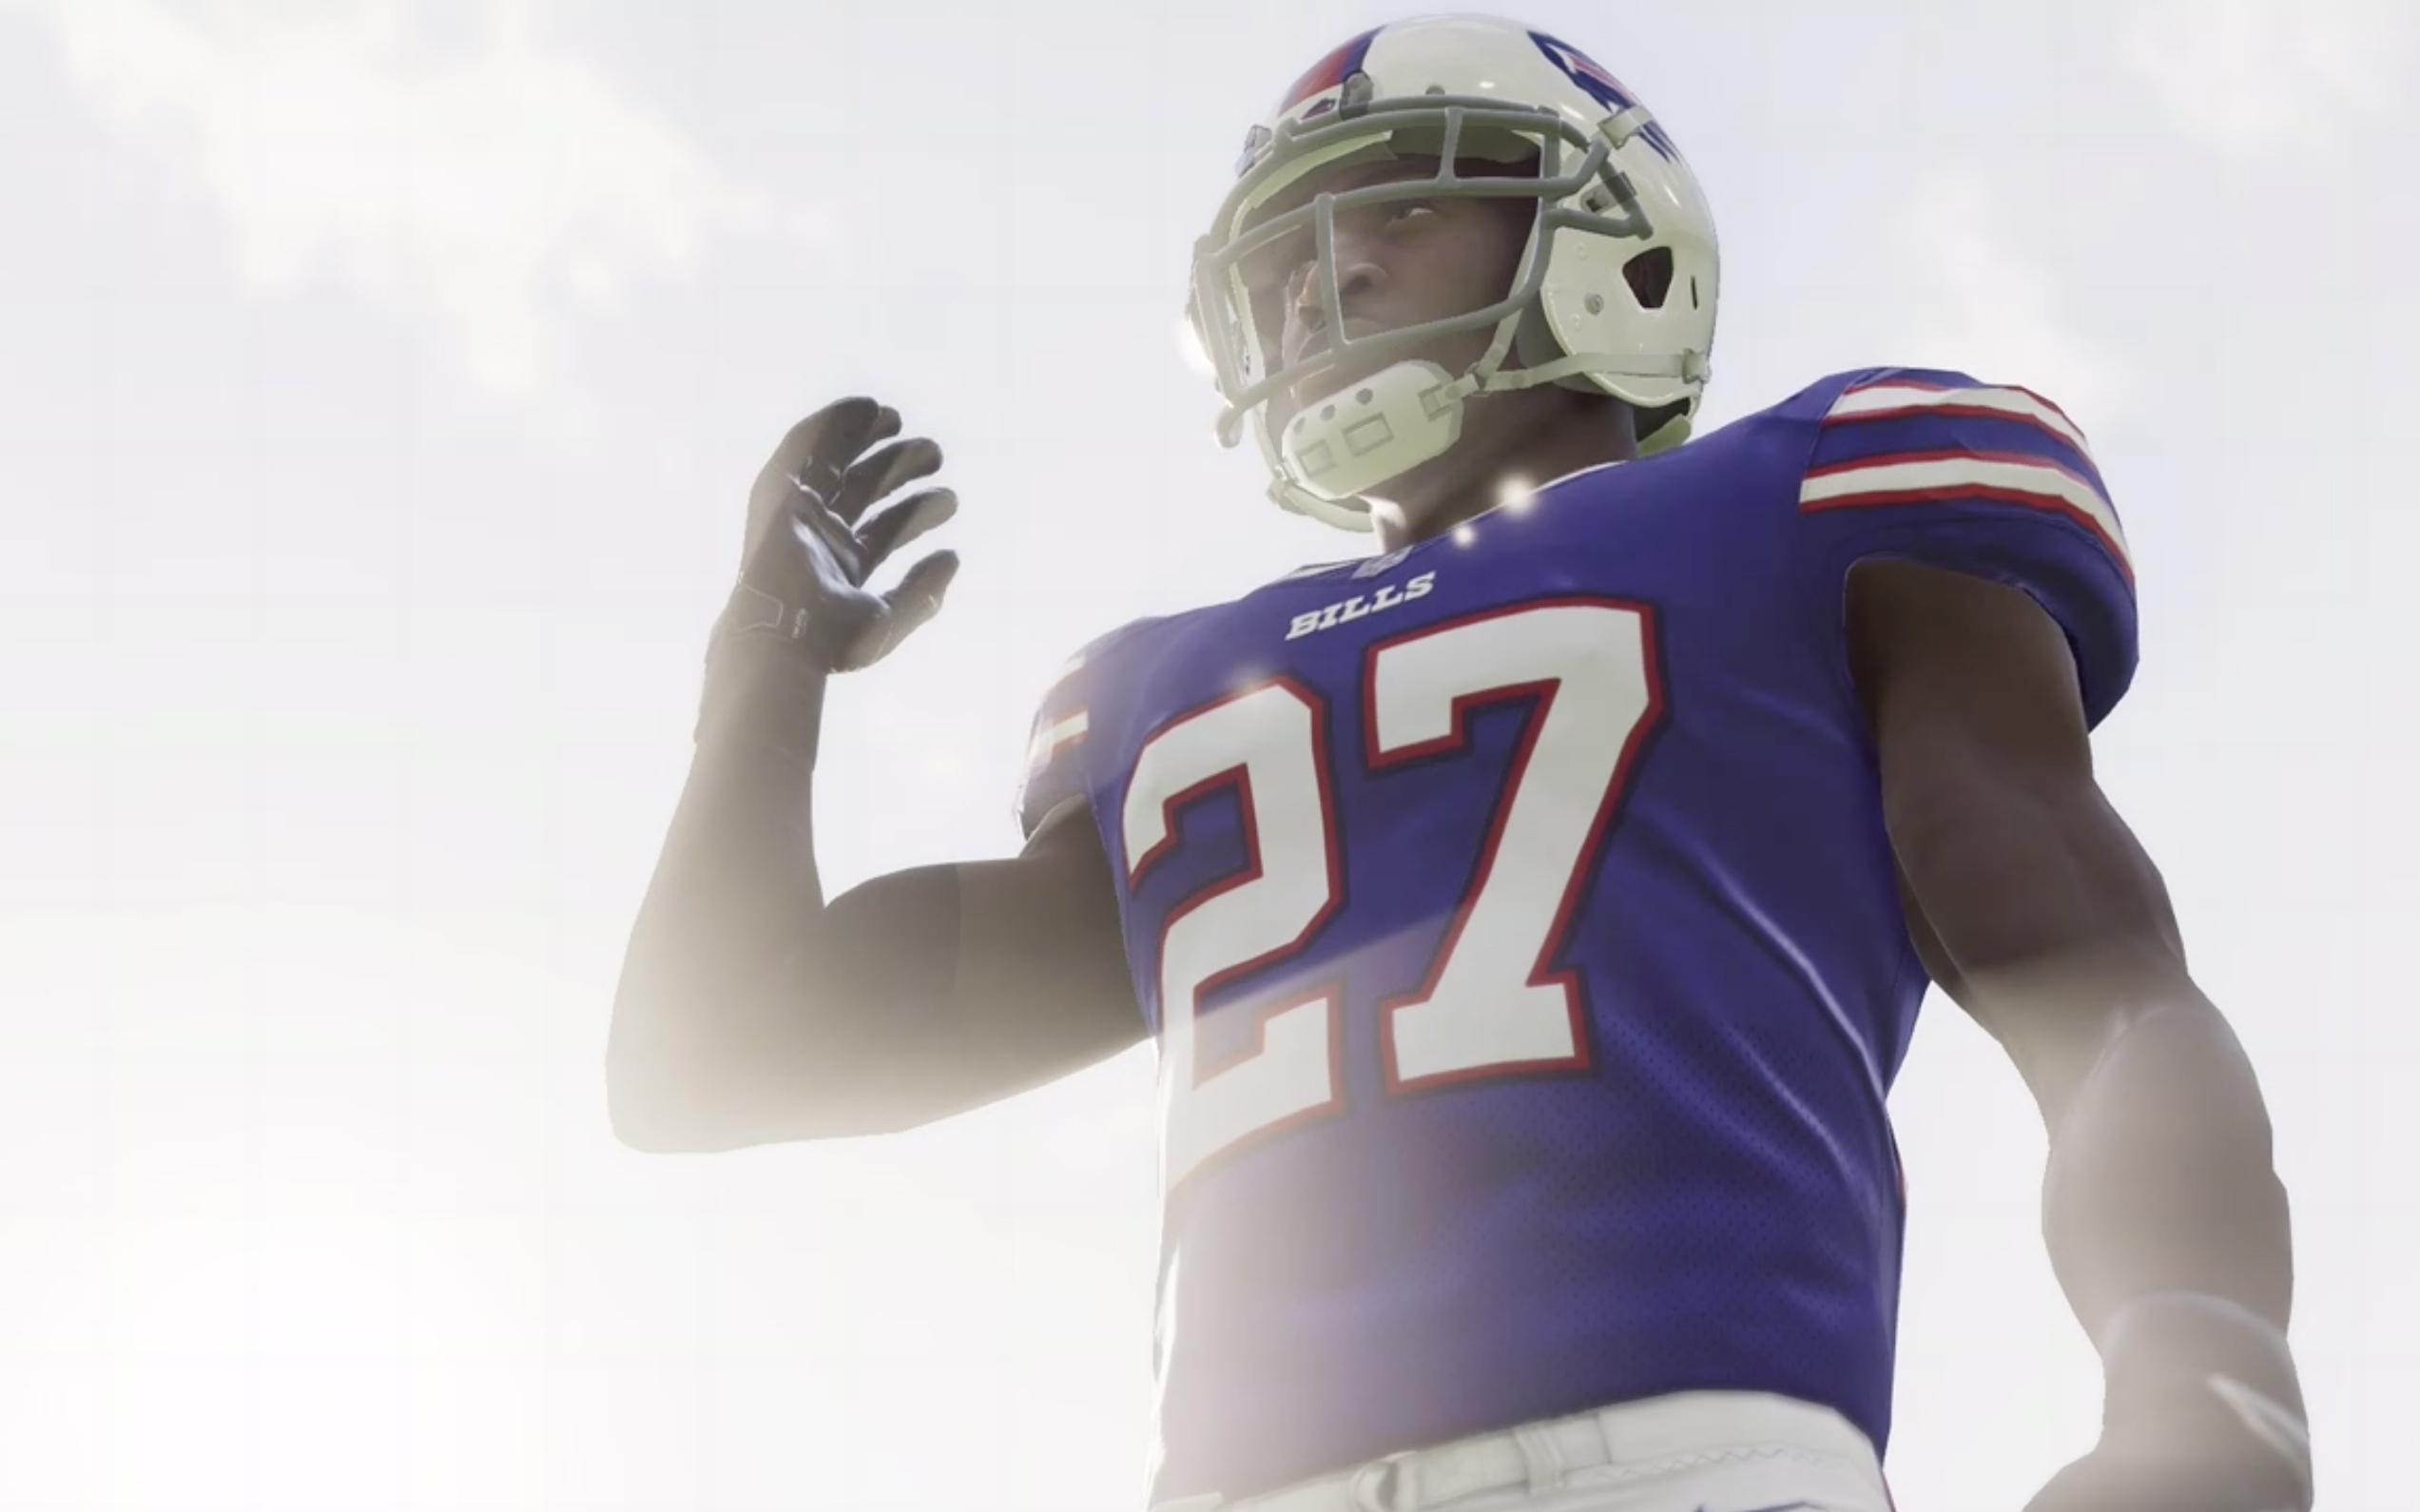 Bills player in Madden 21